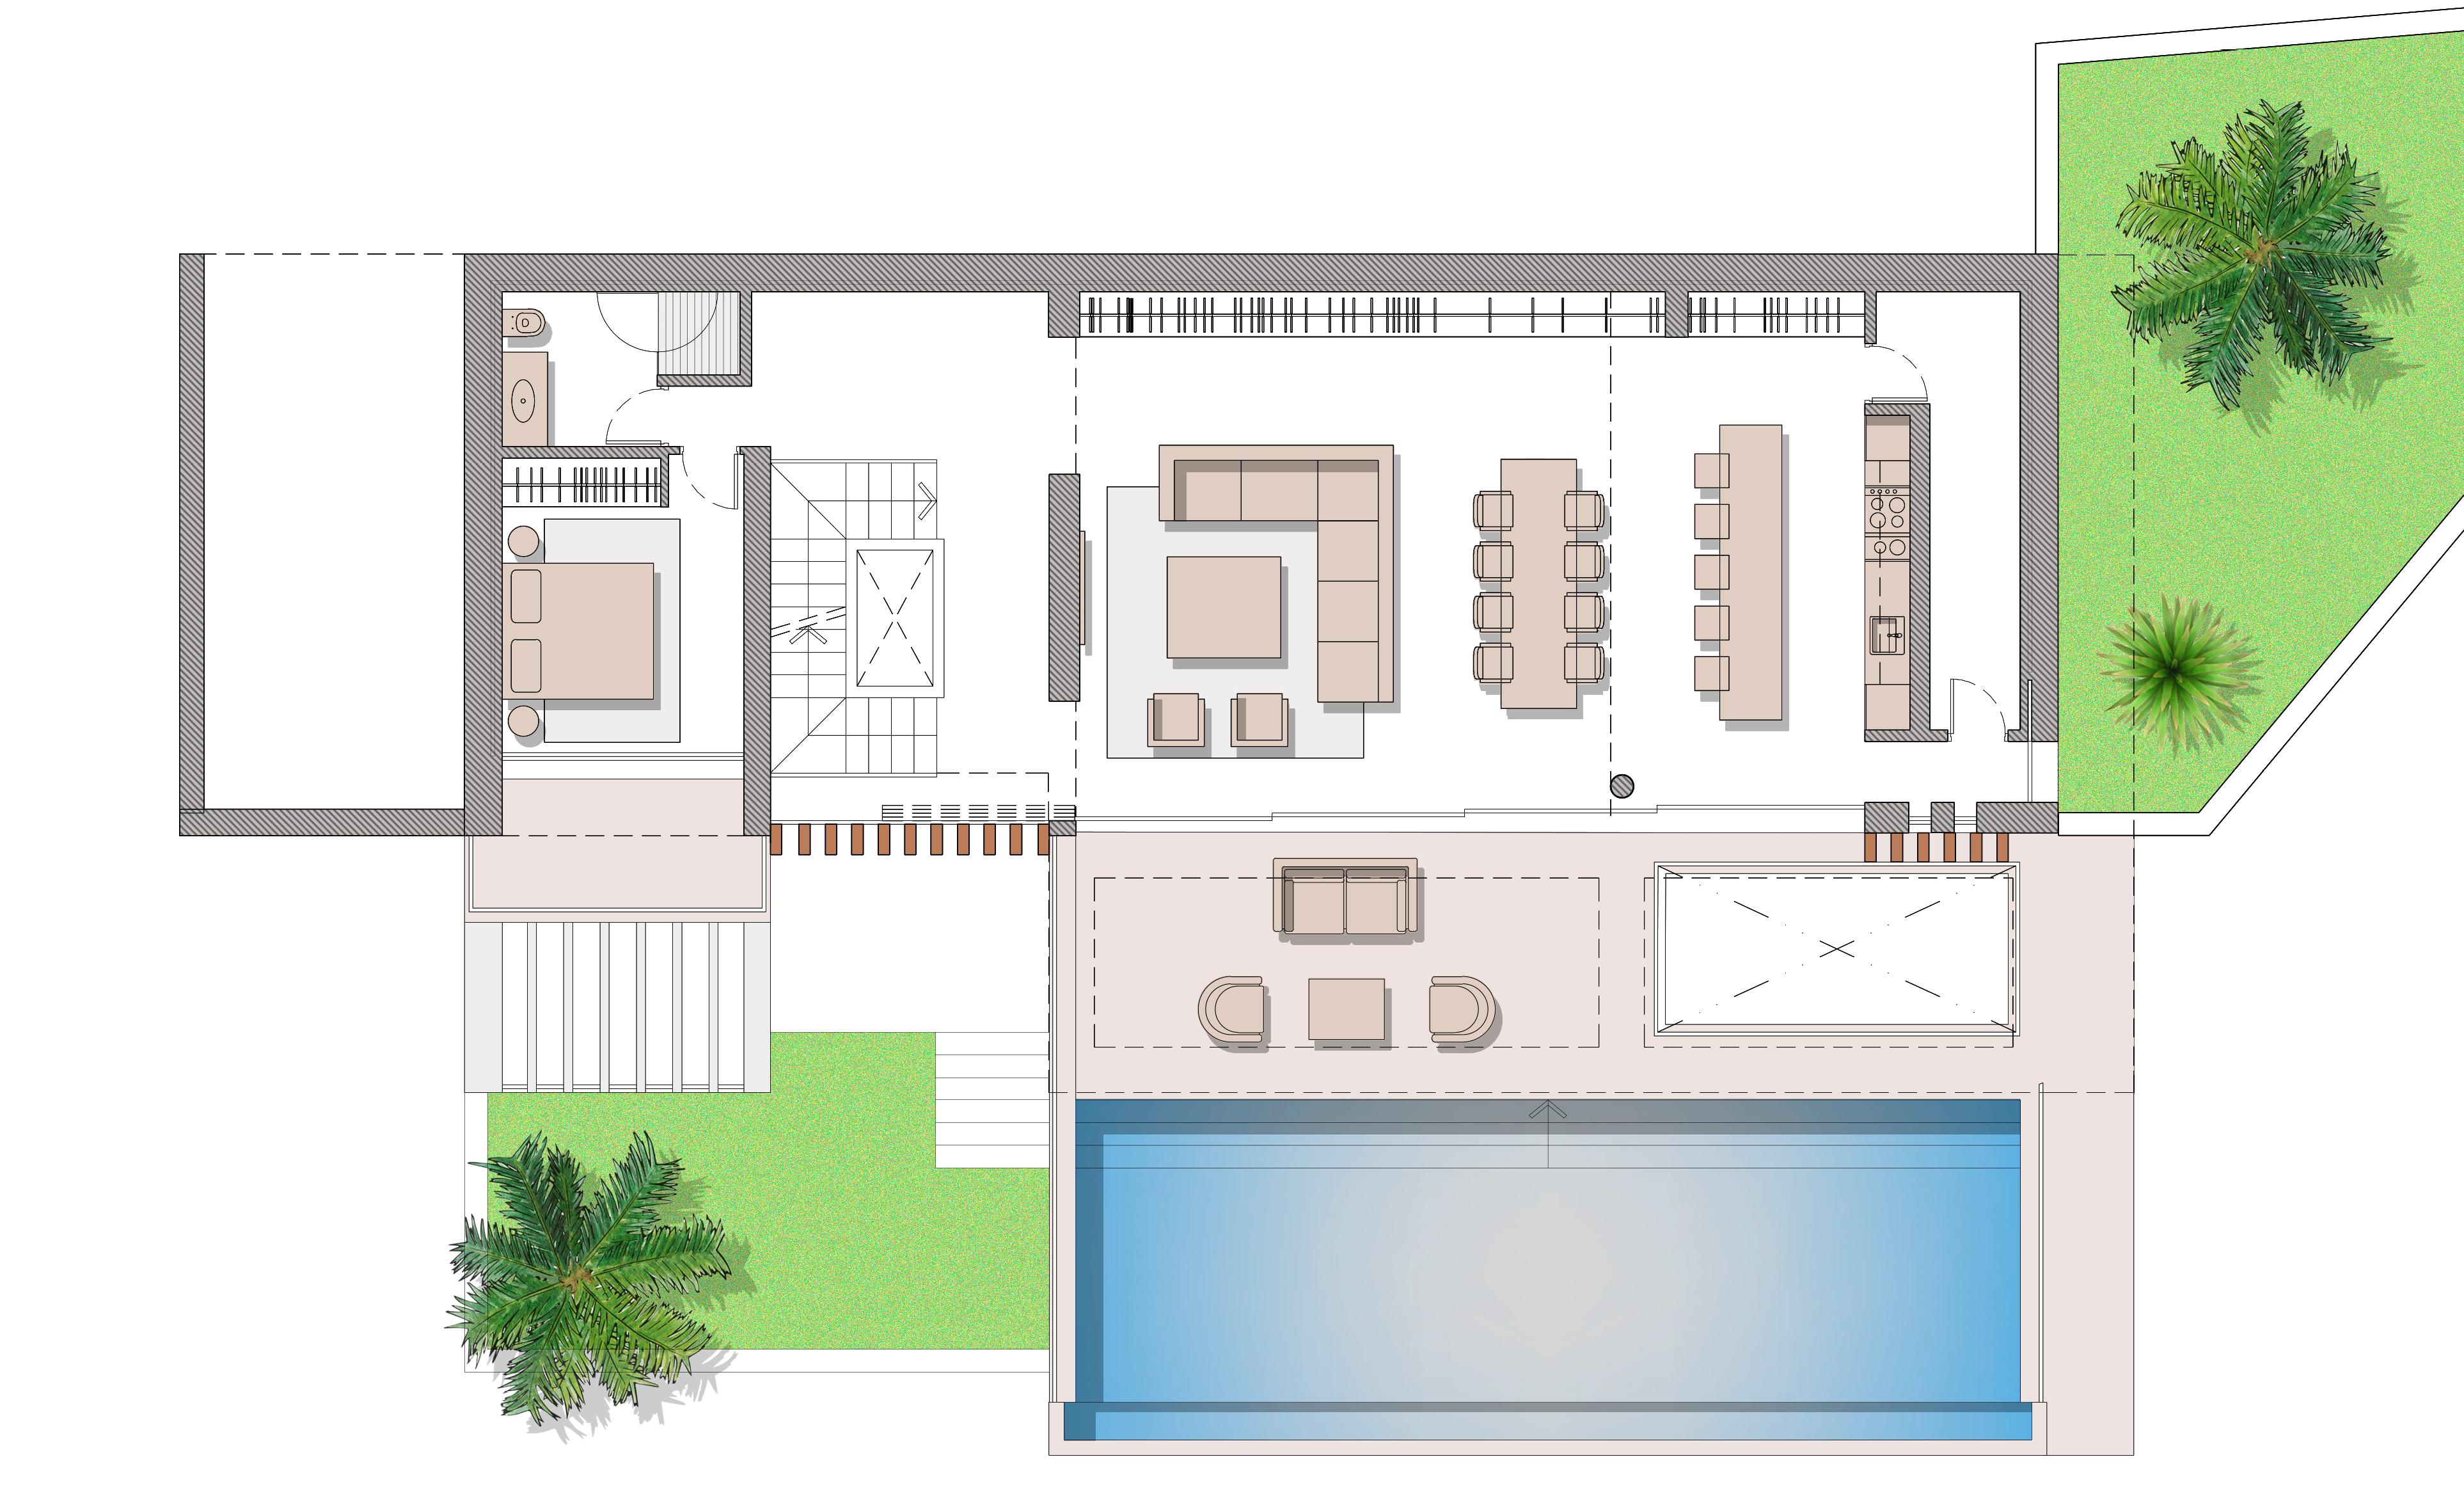 Qlistings - Villa Vela Property Image